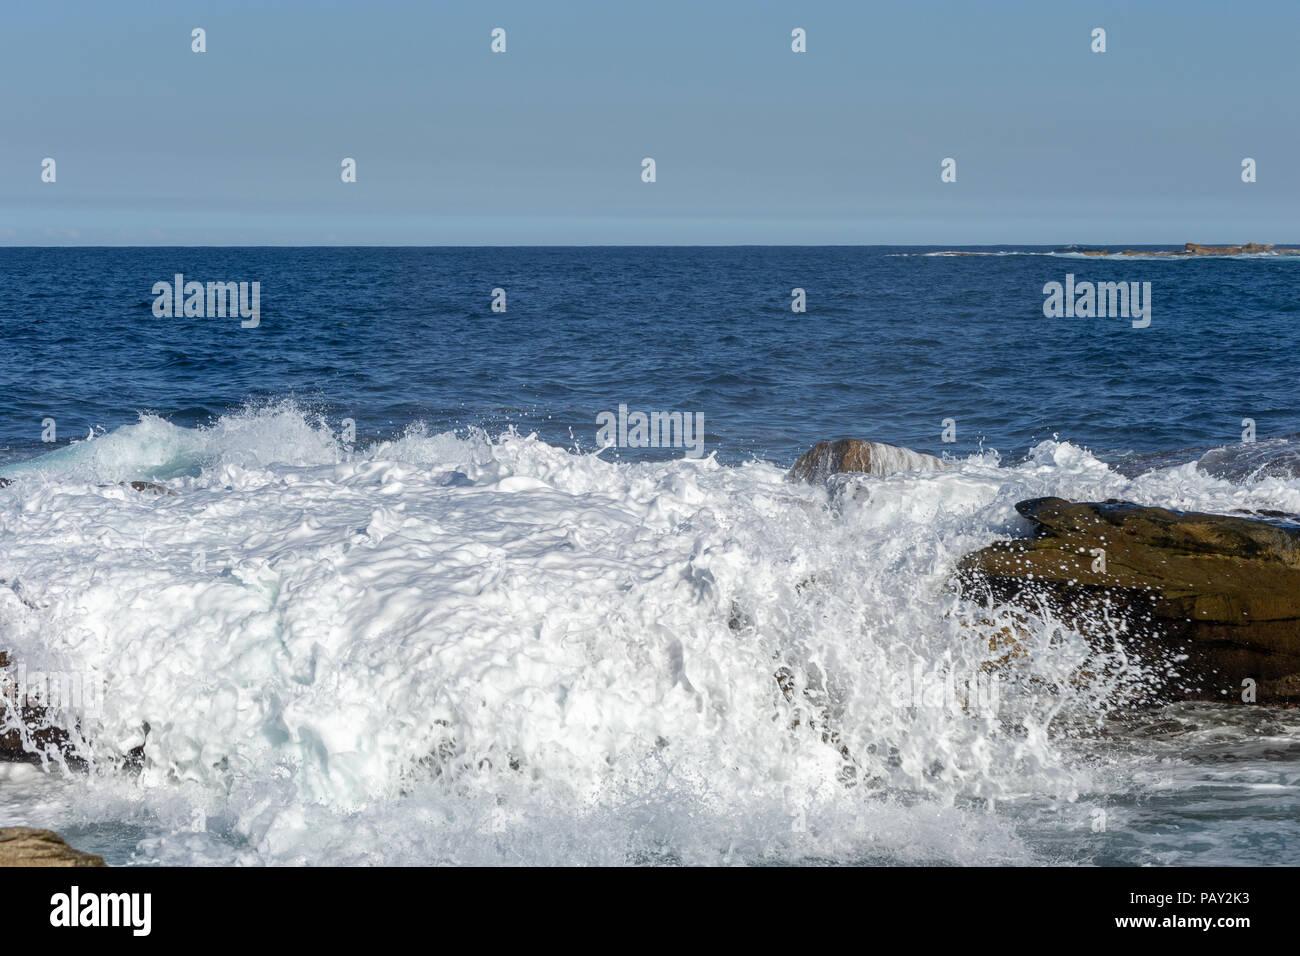 Agua junto al océano. Bondi Beach Sydney NSW Australia Foto de stock